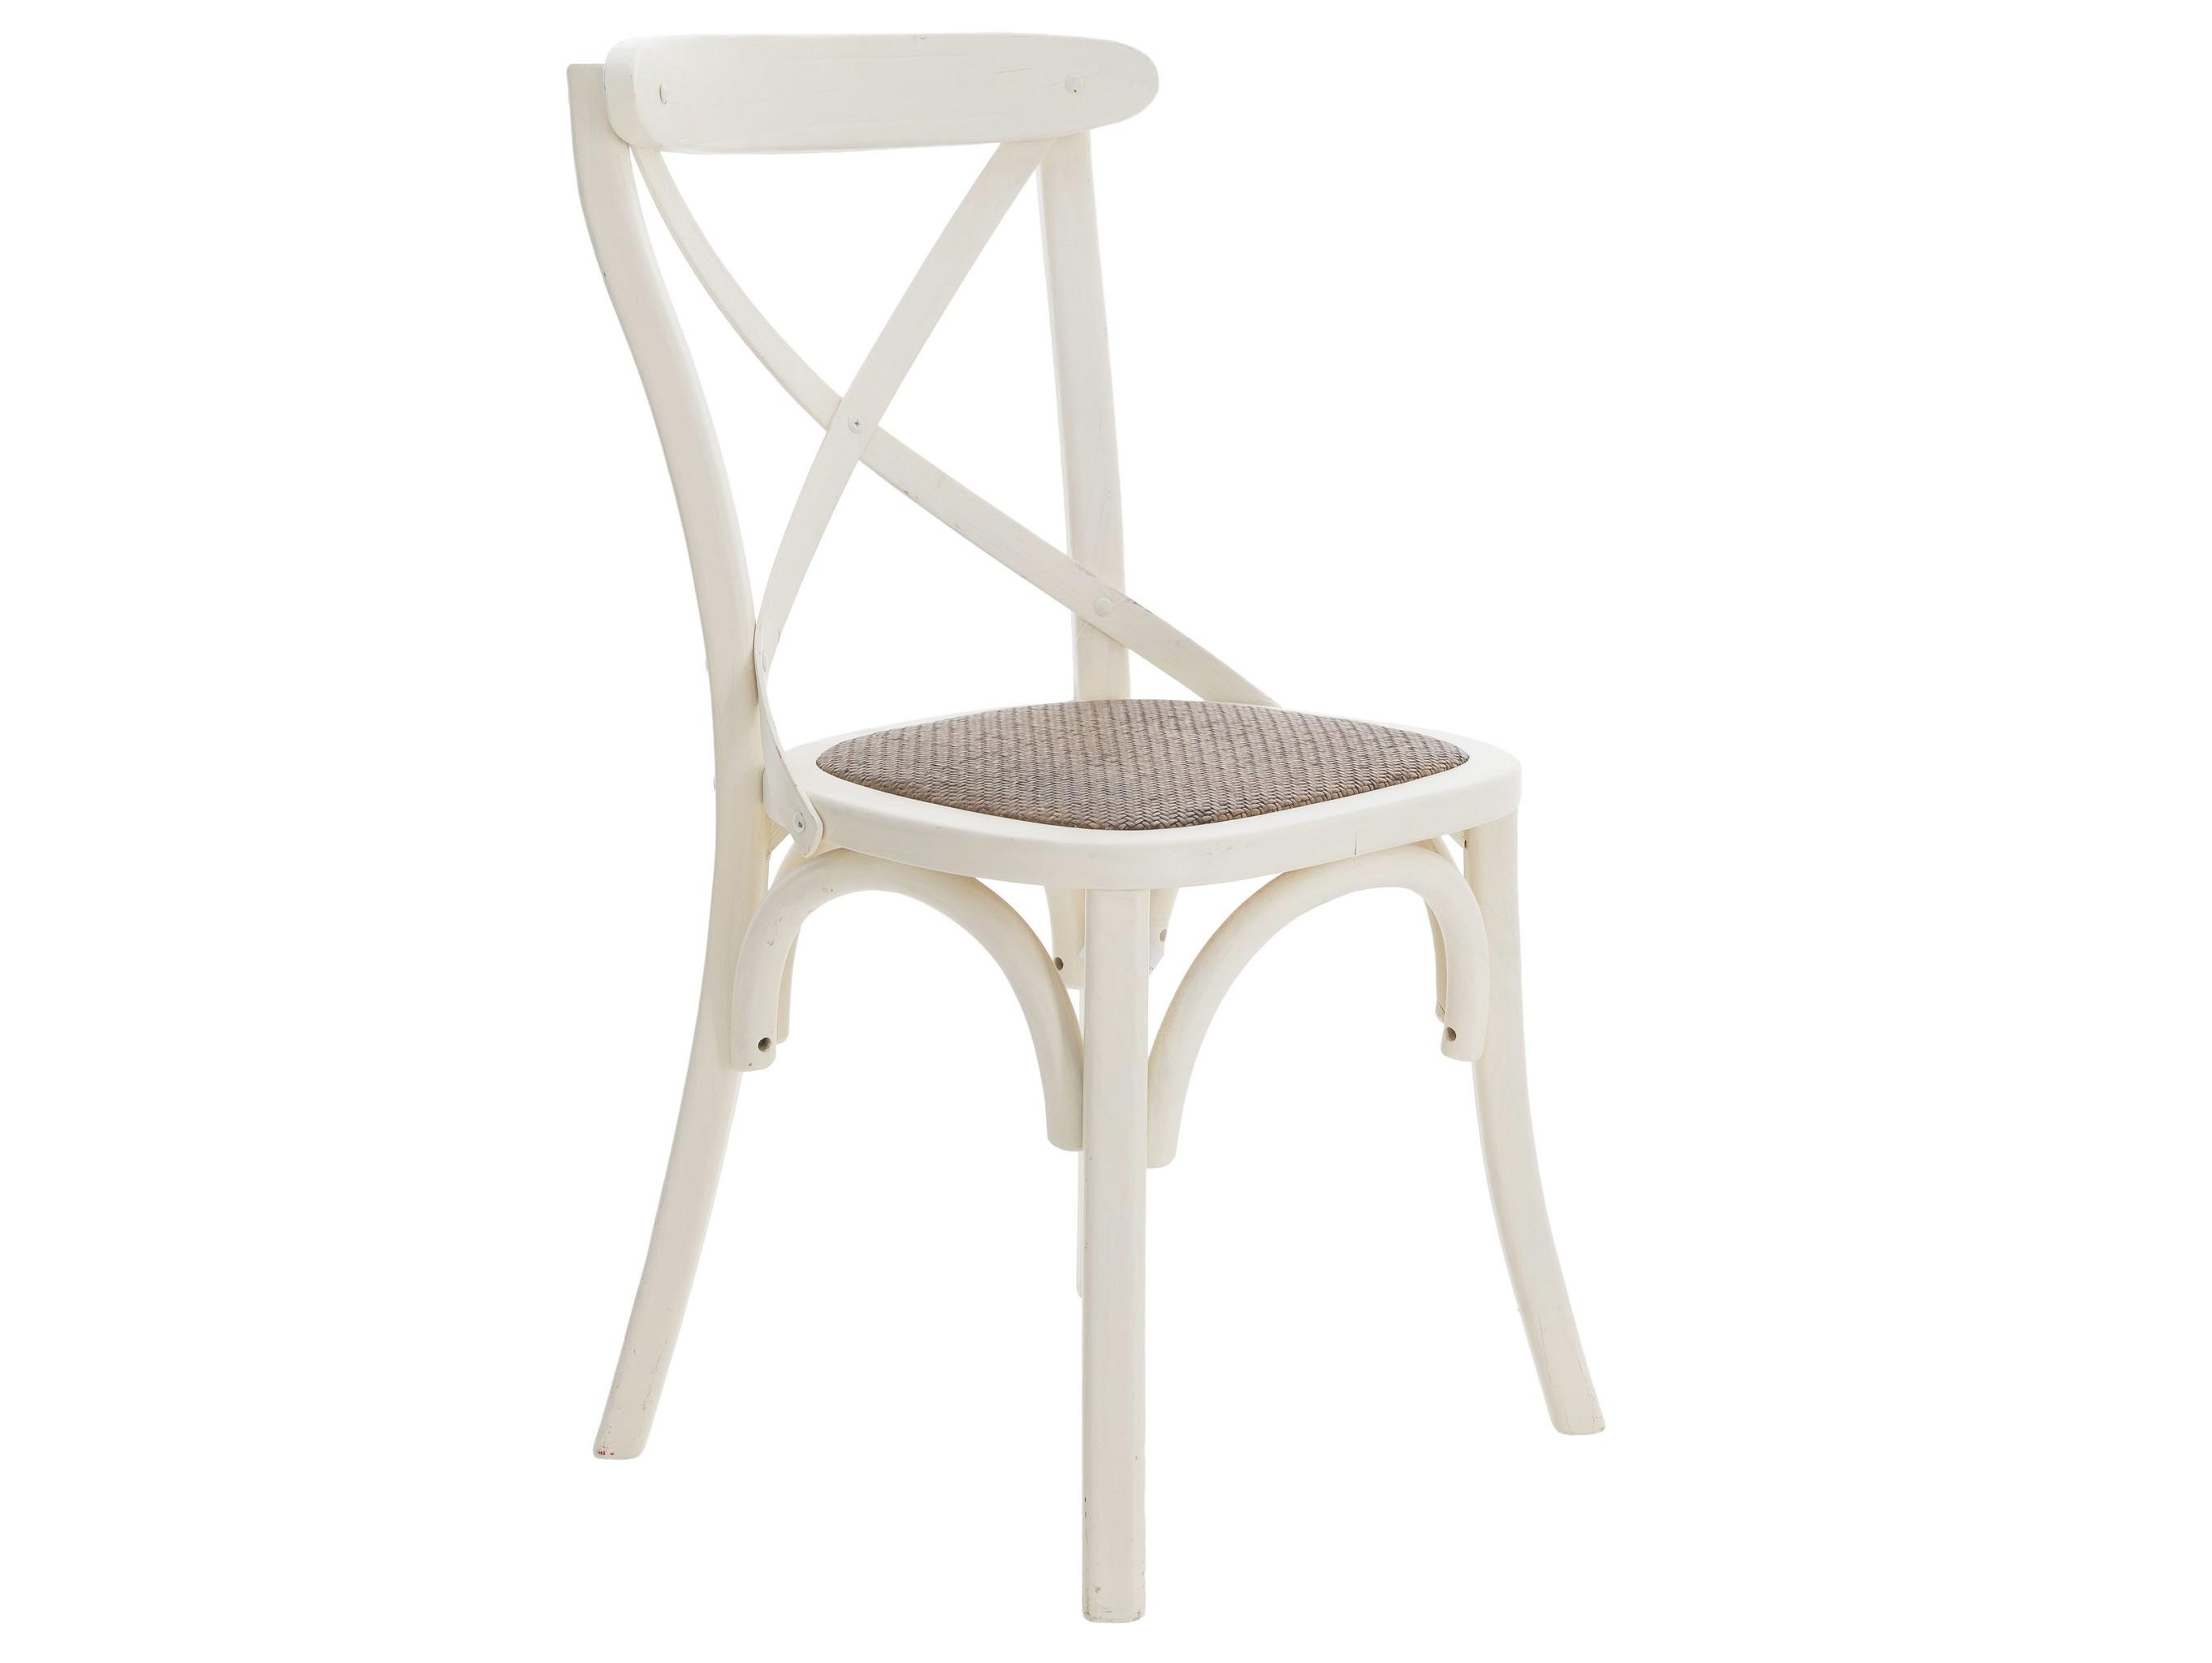 Кухонный стул To4rooms 6338345 от thefurnish